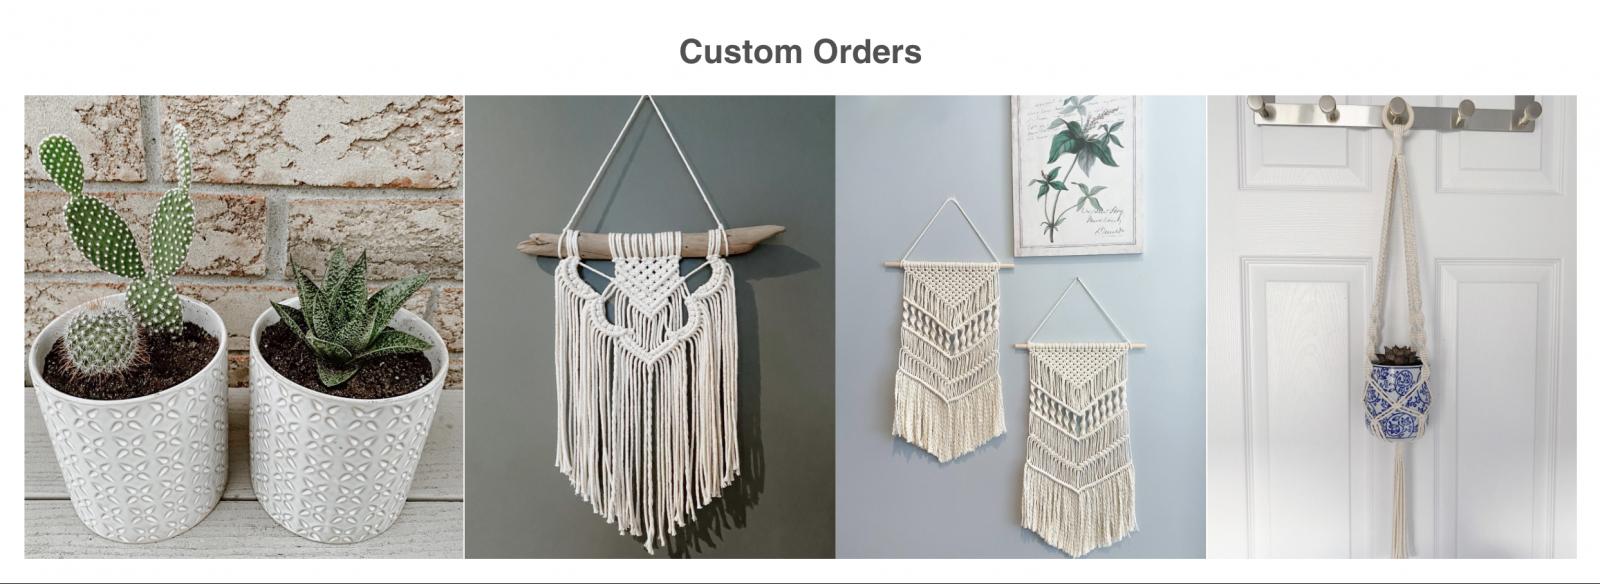 custom order photo wall shopify